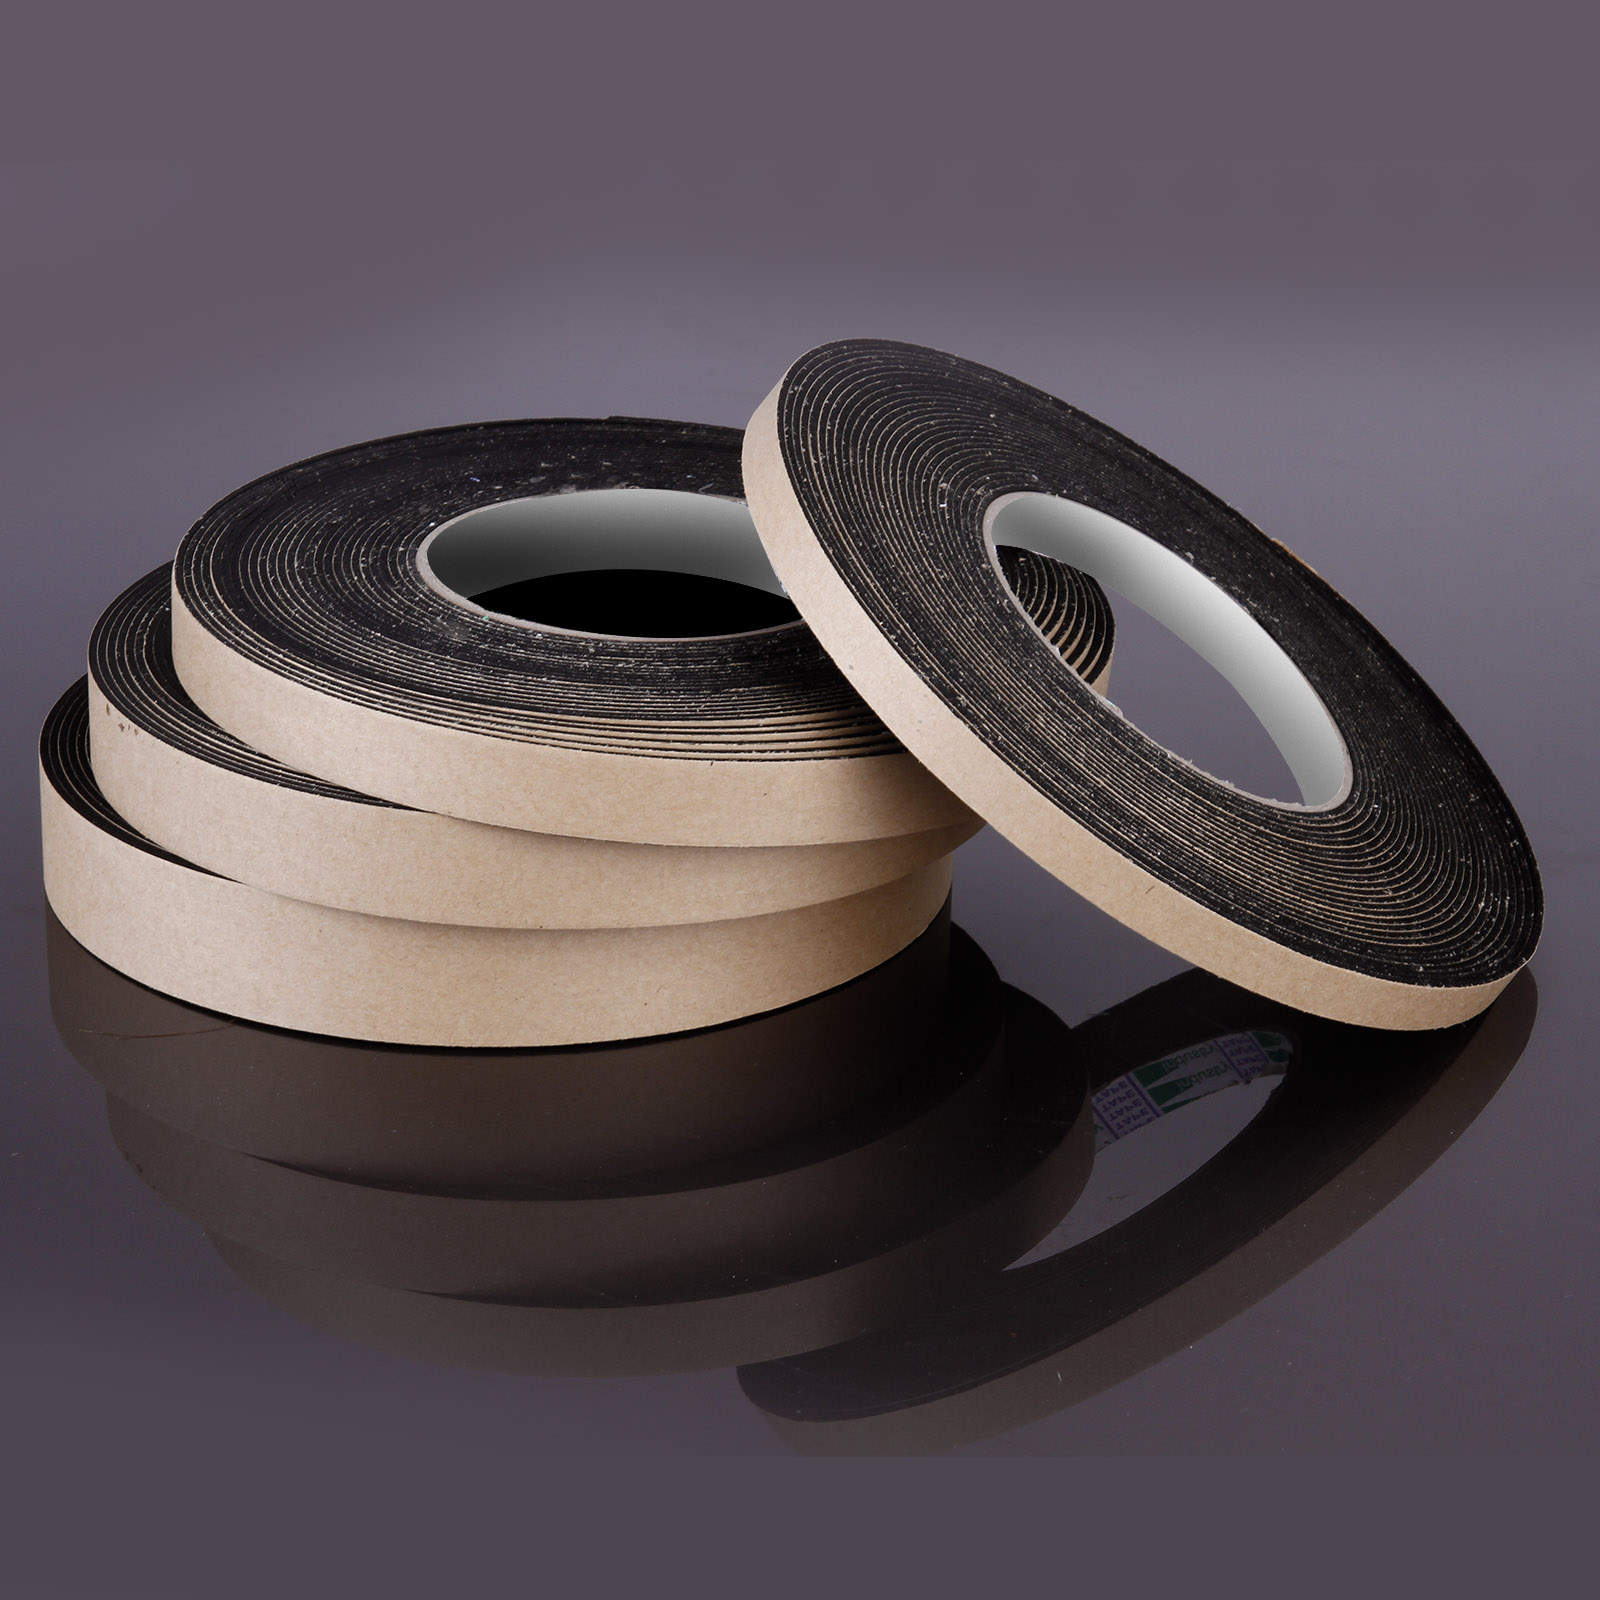 zellkautschuk einseitig selbstklebend 10m rolle moosgummi. Black Bedroom Furniture Sets. Home Design Ideas